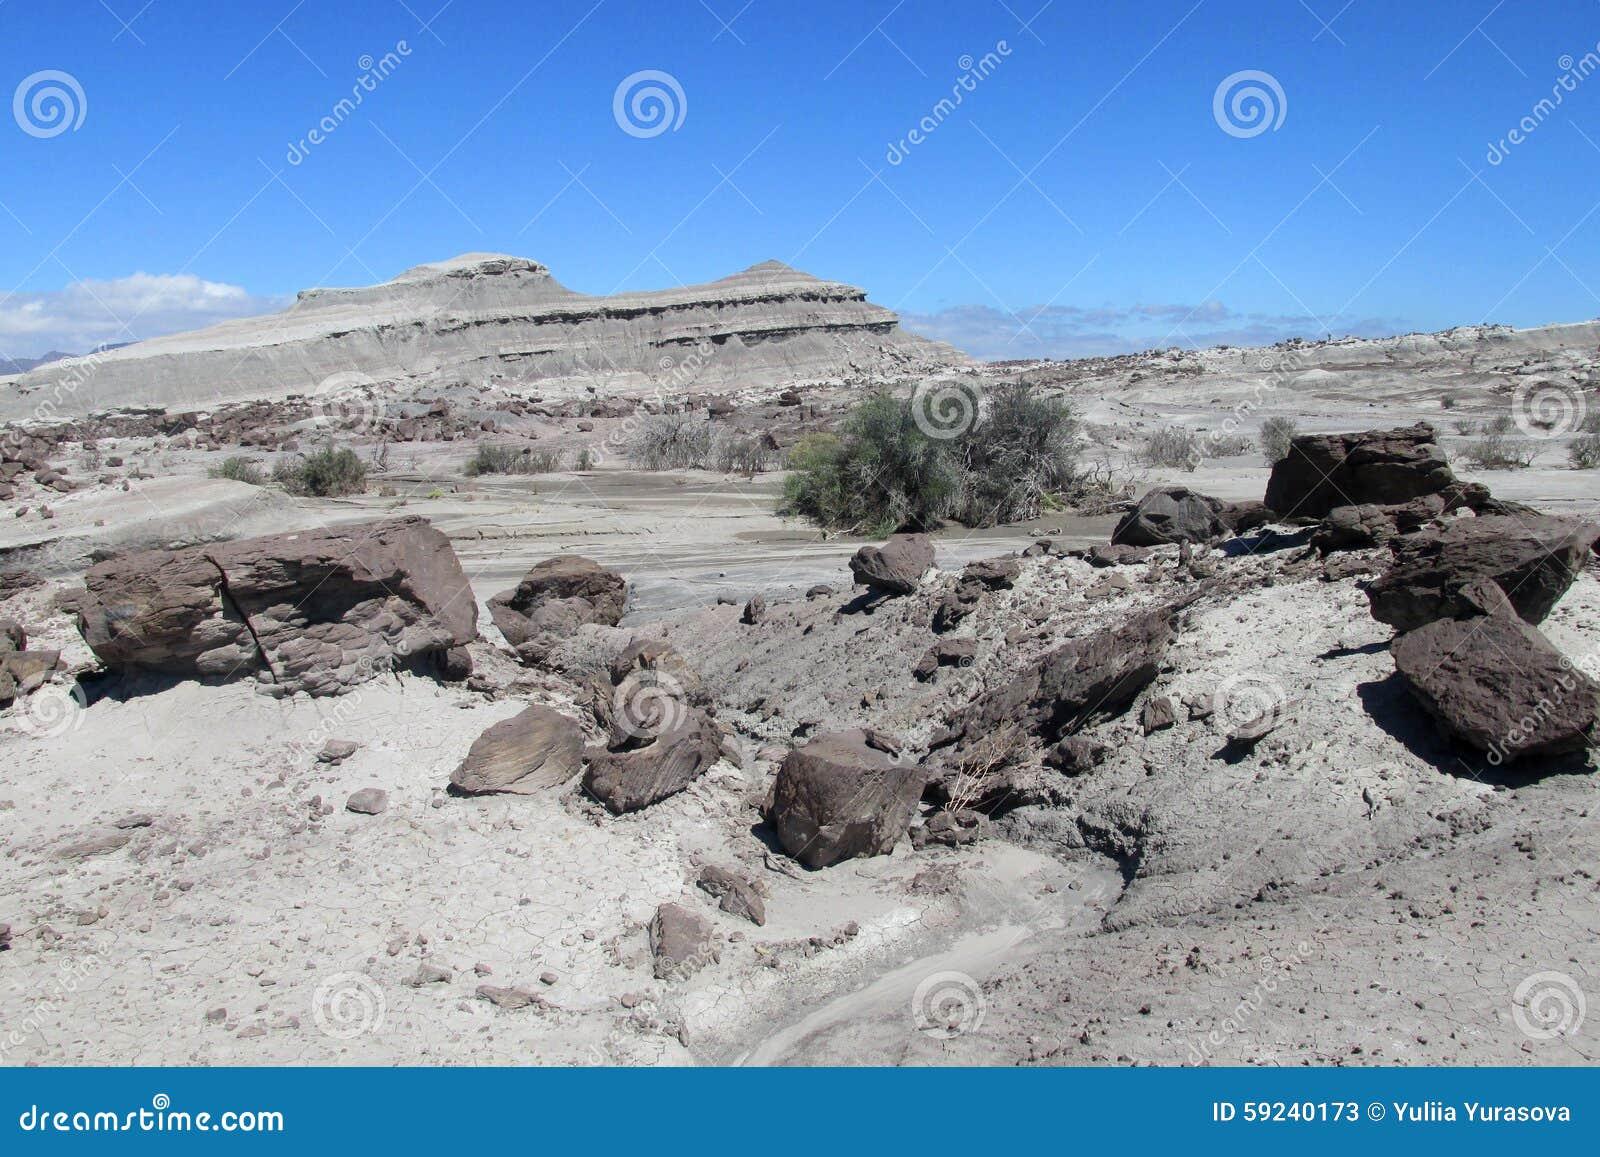 Download Desierto de piedra gris imagen de archivo. Imagen de equilibree - 59240173